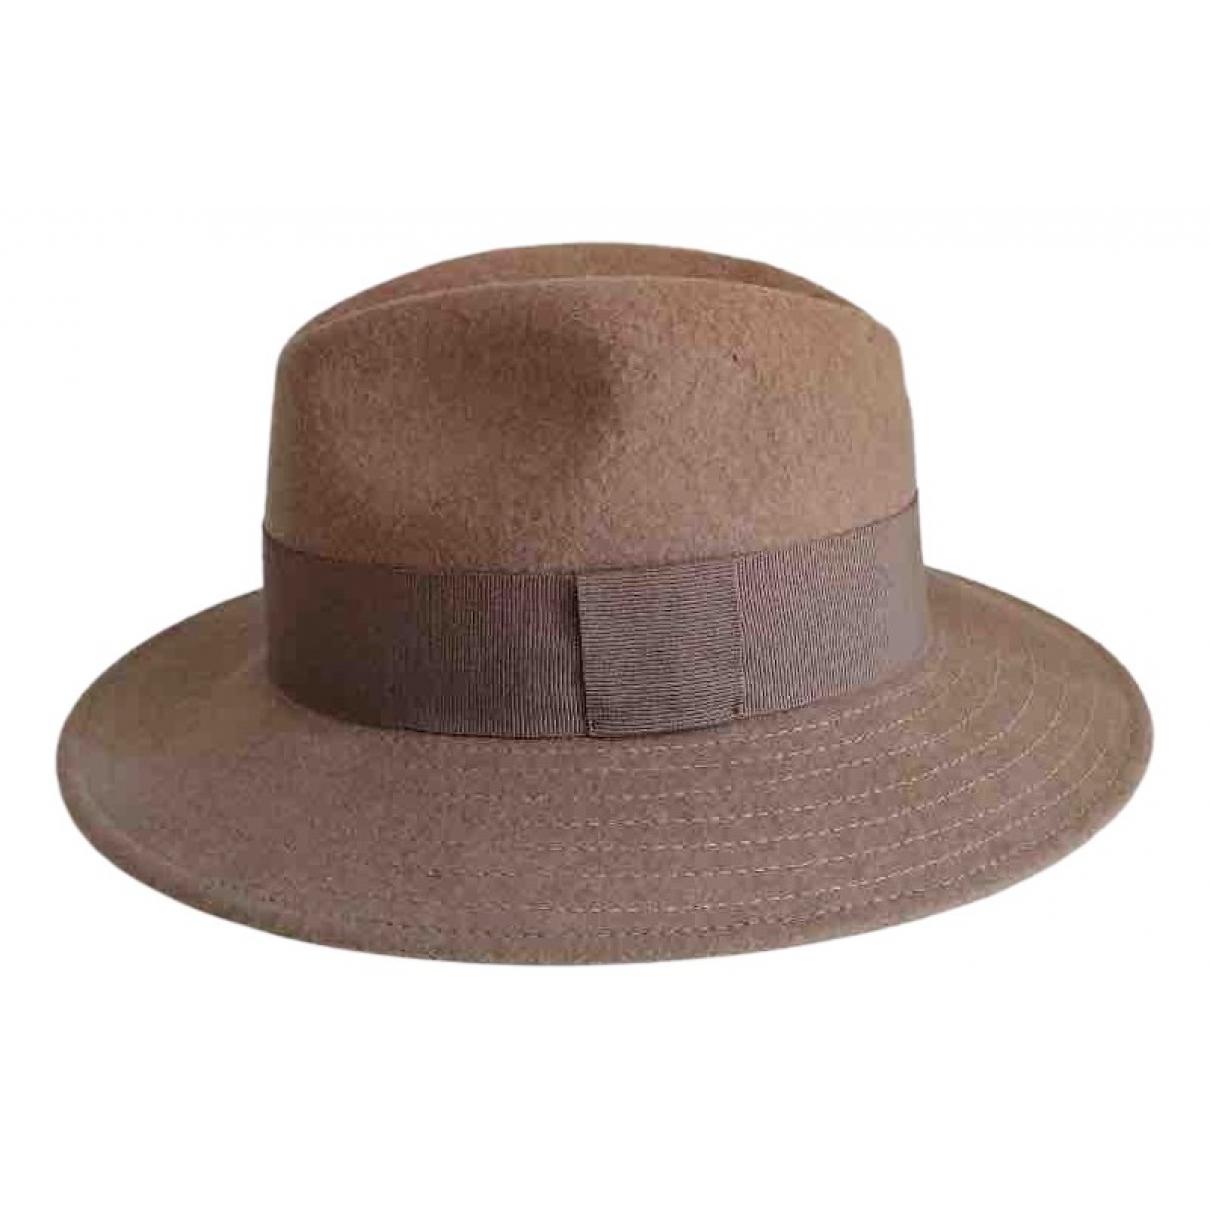 Paul Smith \N Brown Wool hat for Women S International